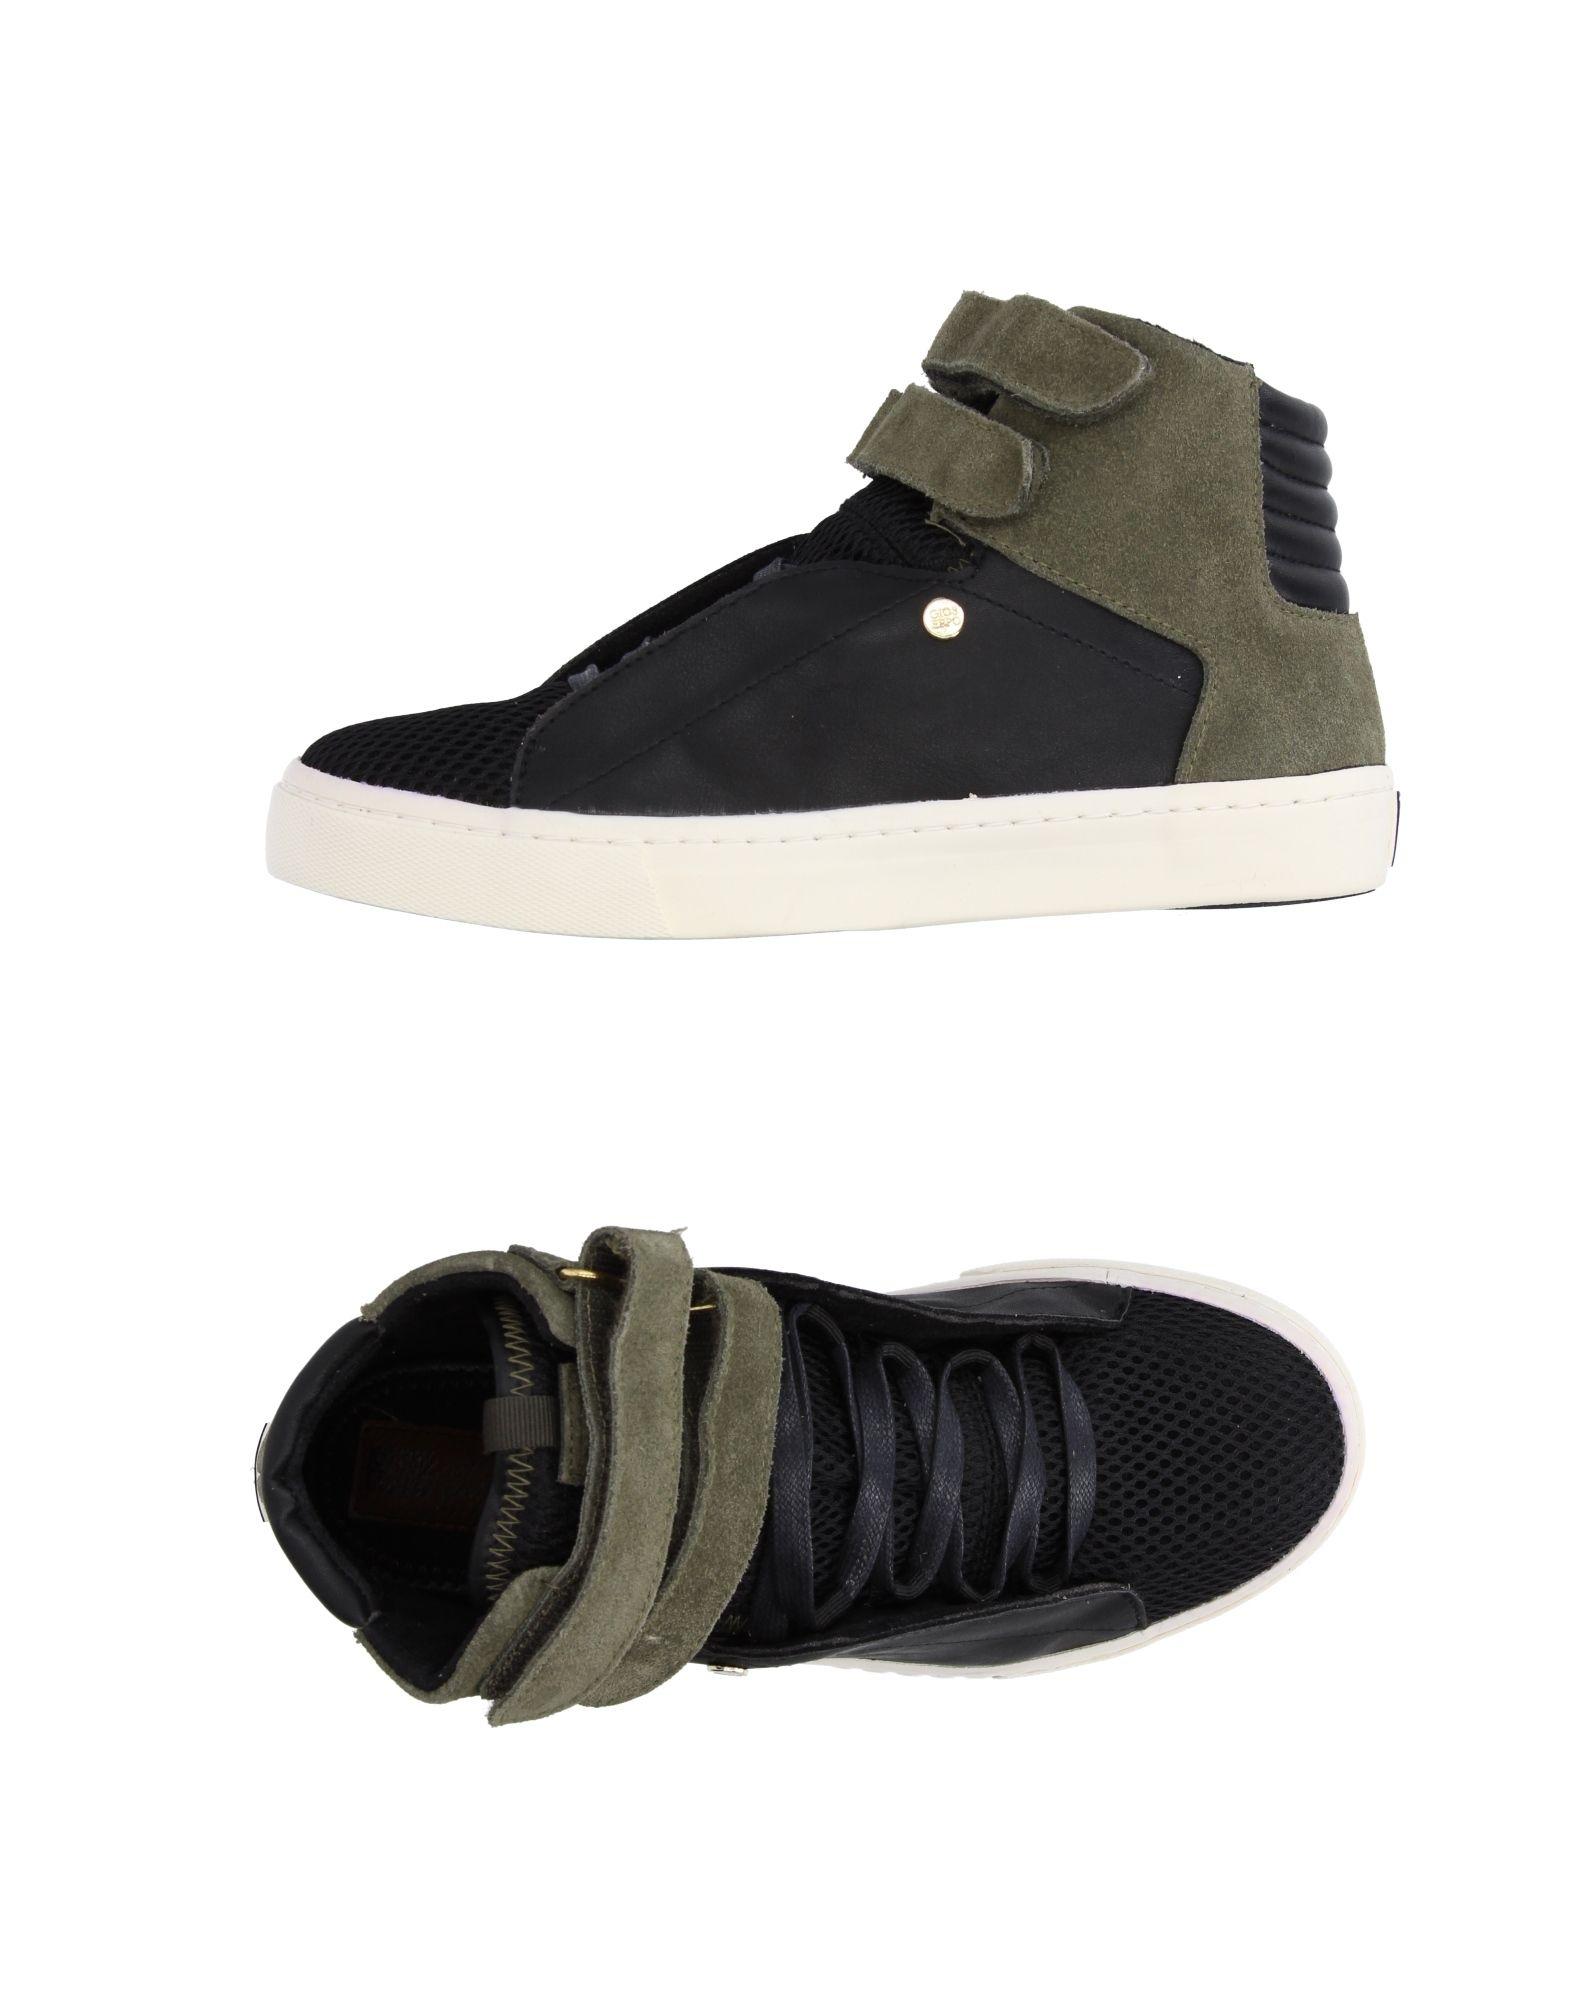 Gioseppo on Sneakers - Women Gioseppo Sneakers online on Gioseppo  Canada - 11225915TV 271425